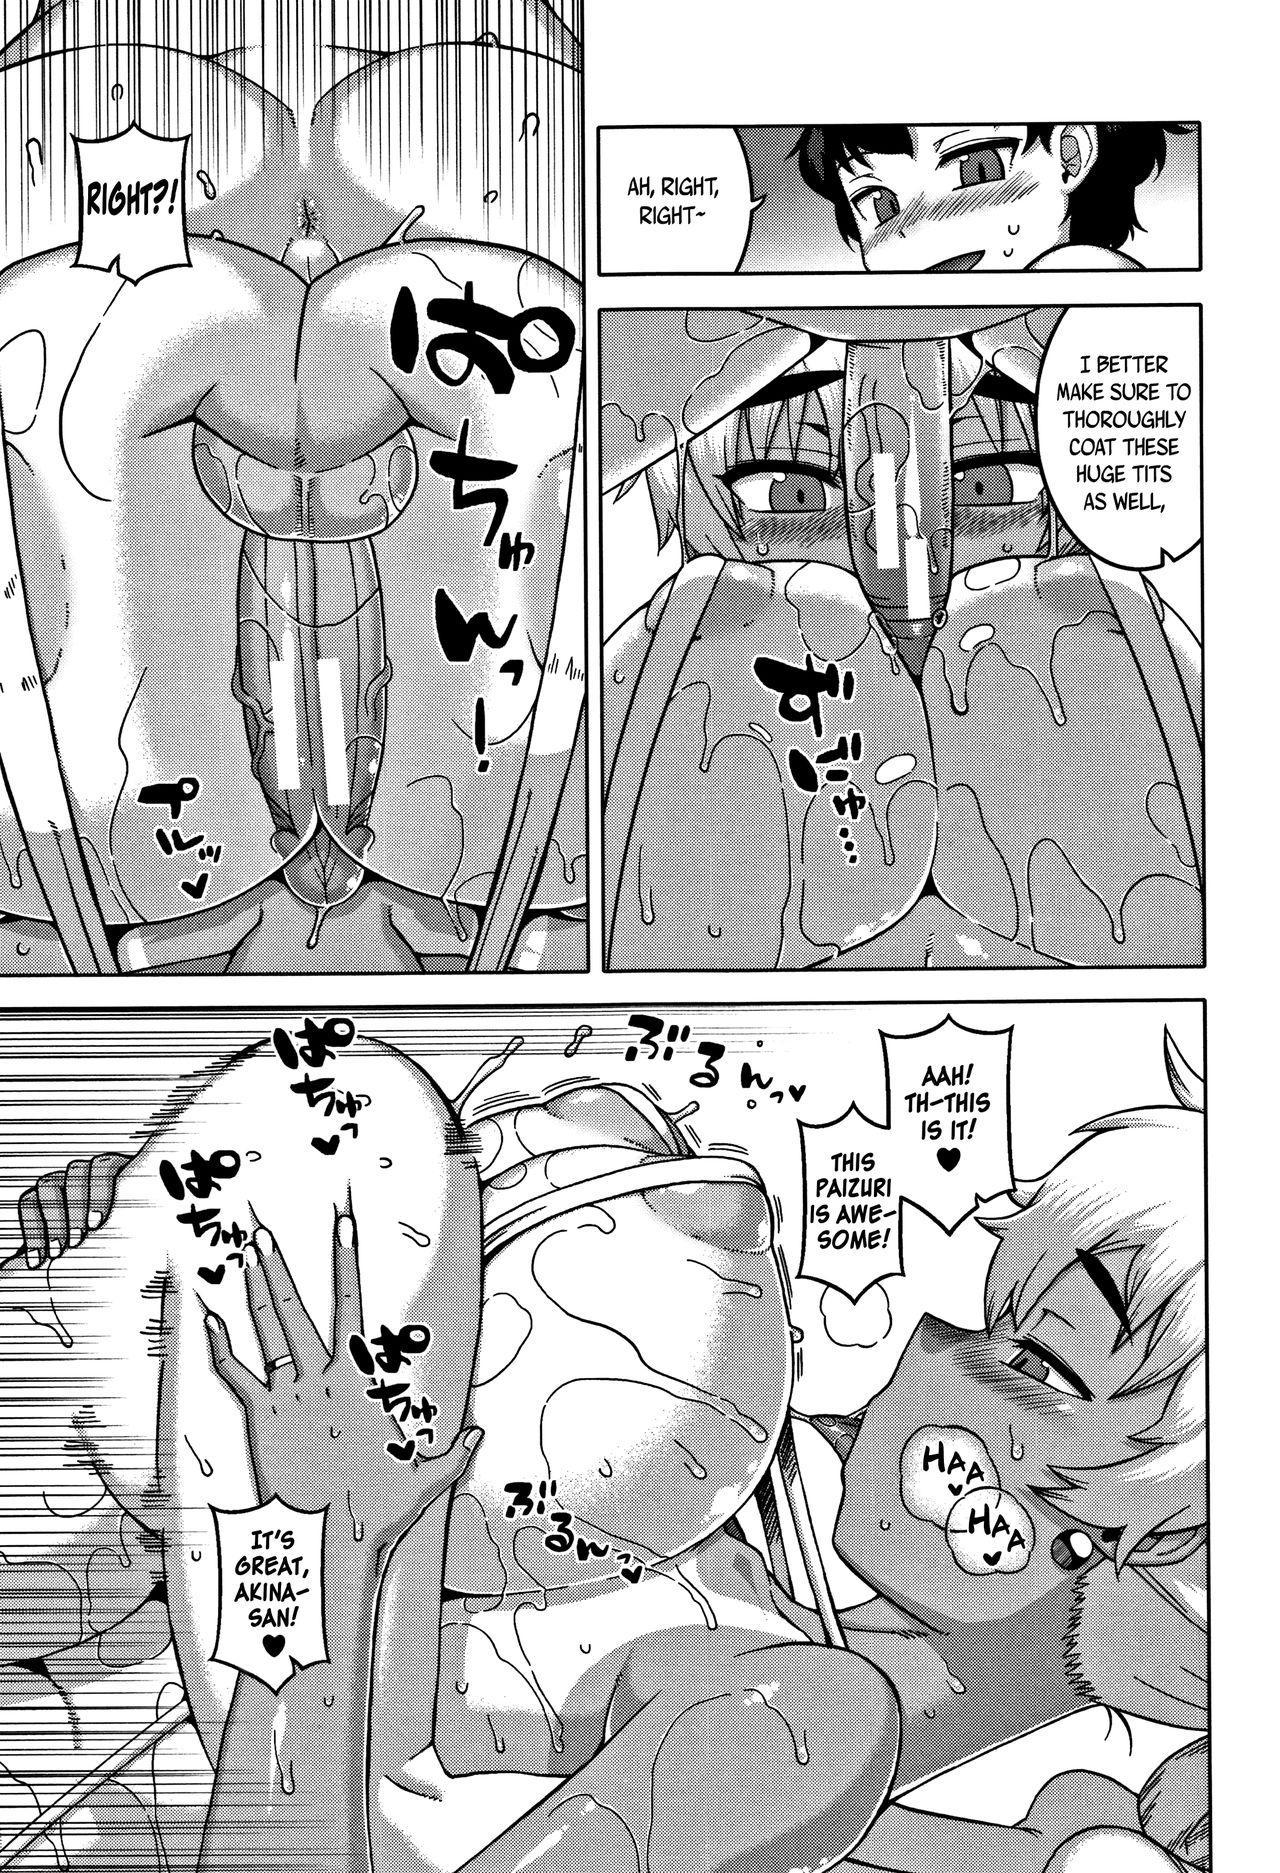 [Takatsu] Hitozuma A-san to Musuko no Yuujin N-kun - Married wife A and son's friend N-kun [English] 53